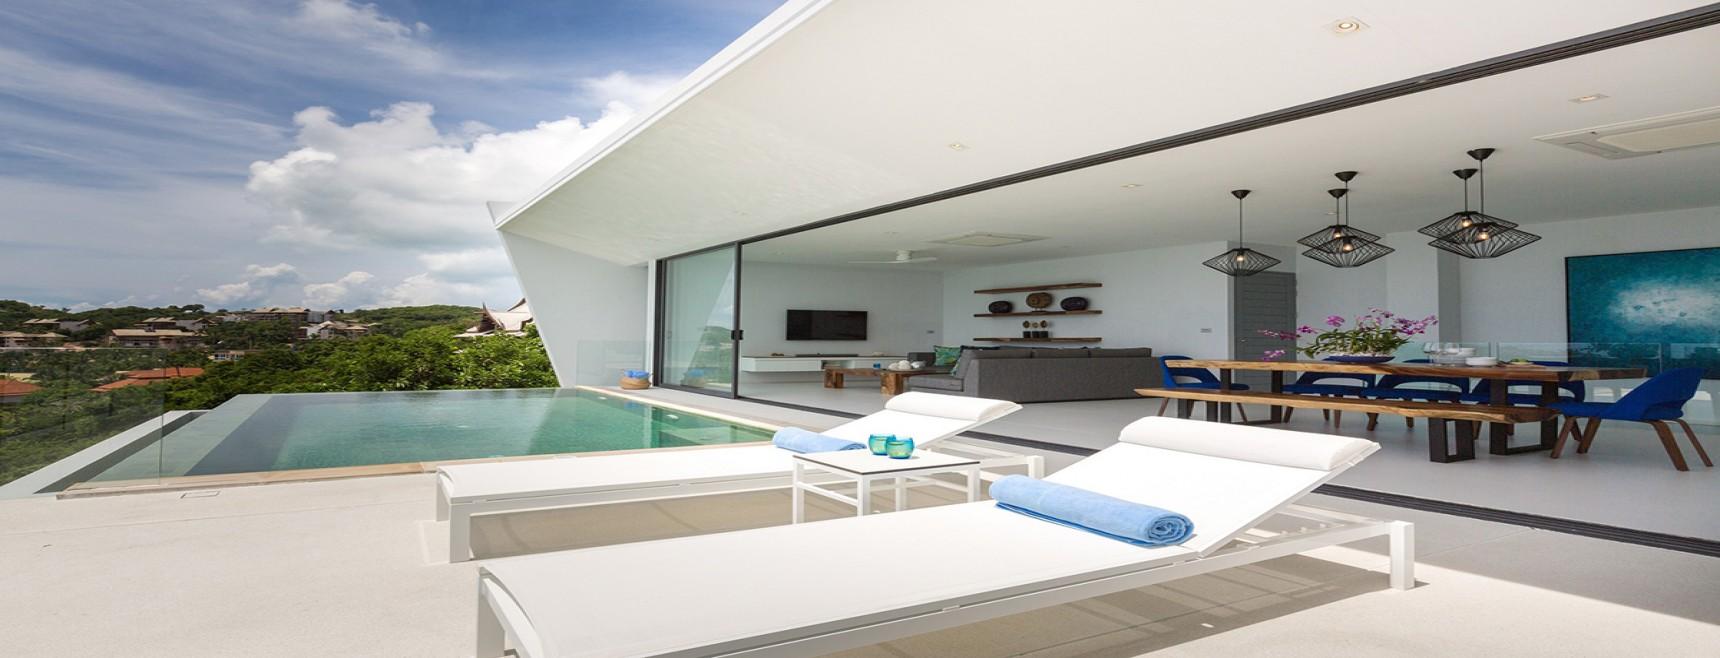 4 Bedrooms, Villa, Residential Sales, 4 Bathrooms, Listing ID 1403, Koh Samui,